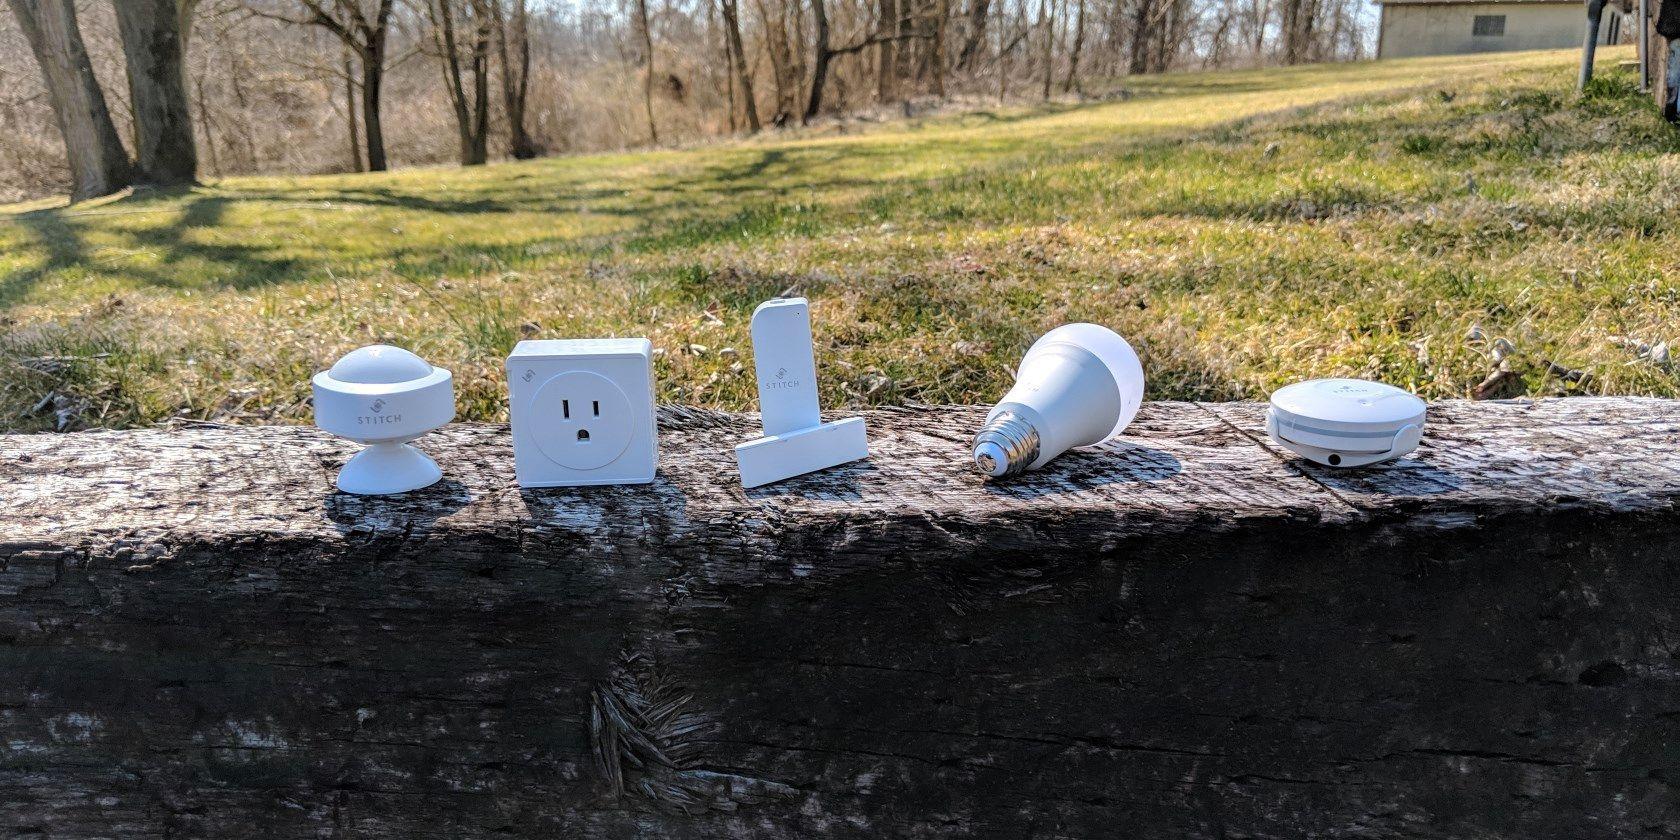 Should You Buy a Smart Home Starter Kit?